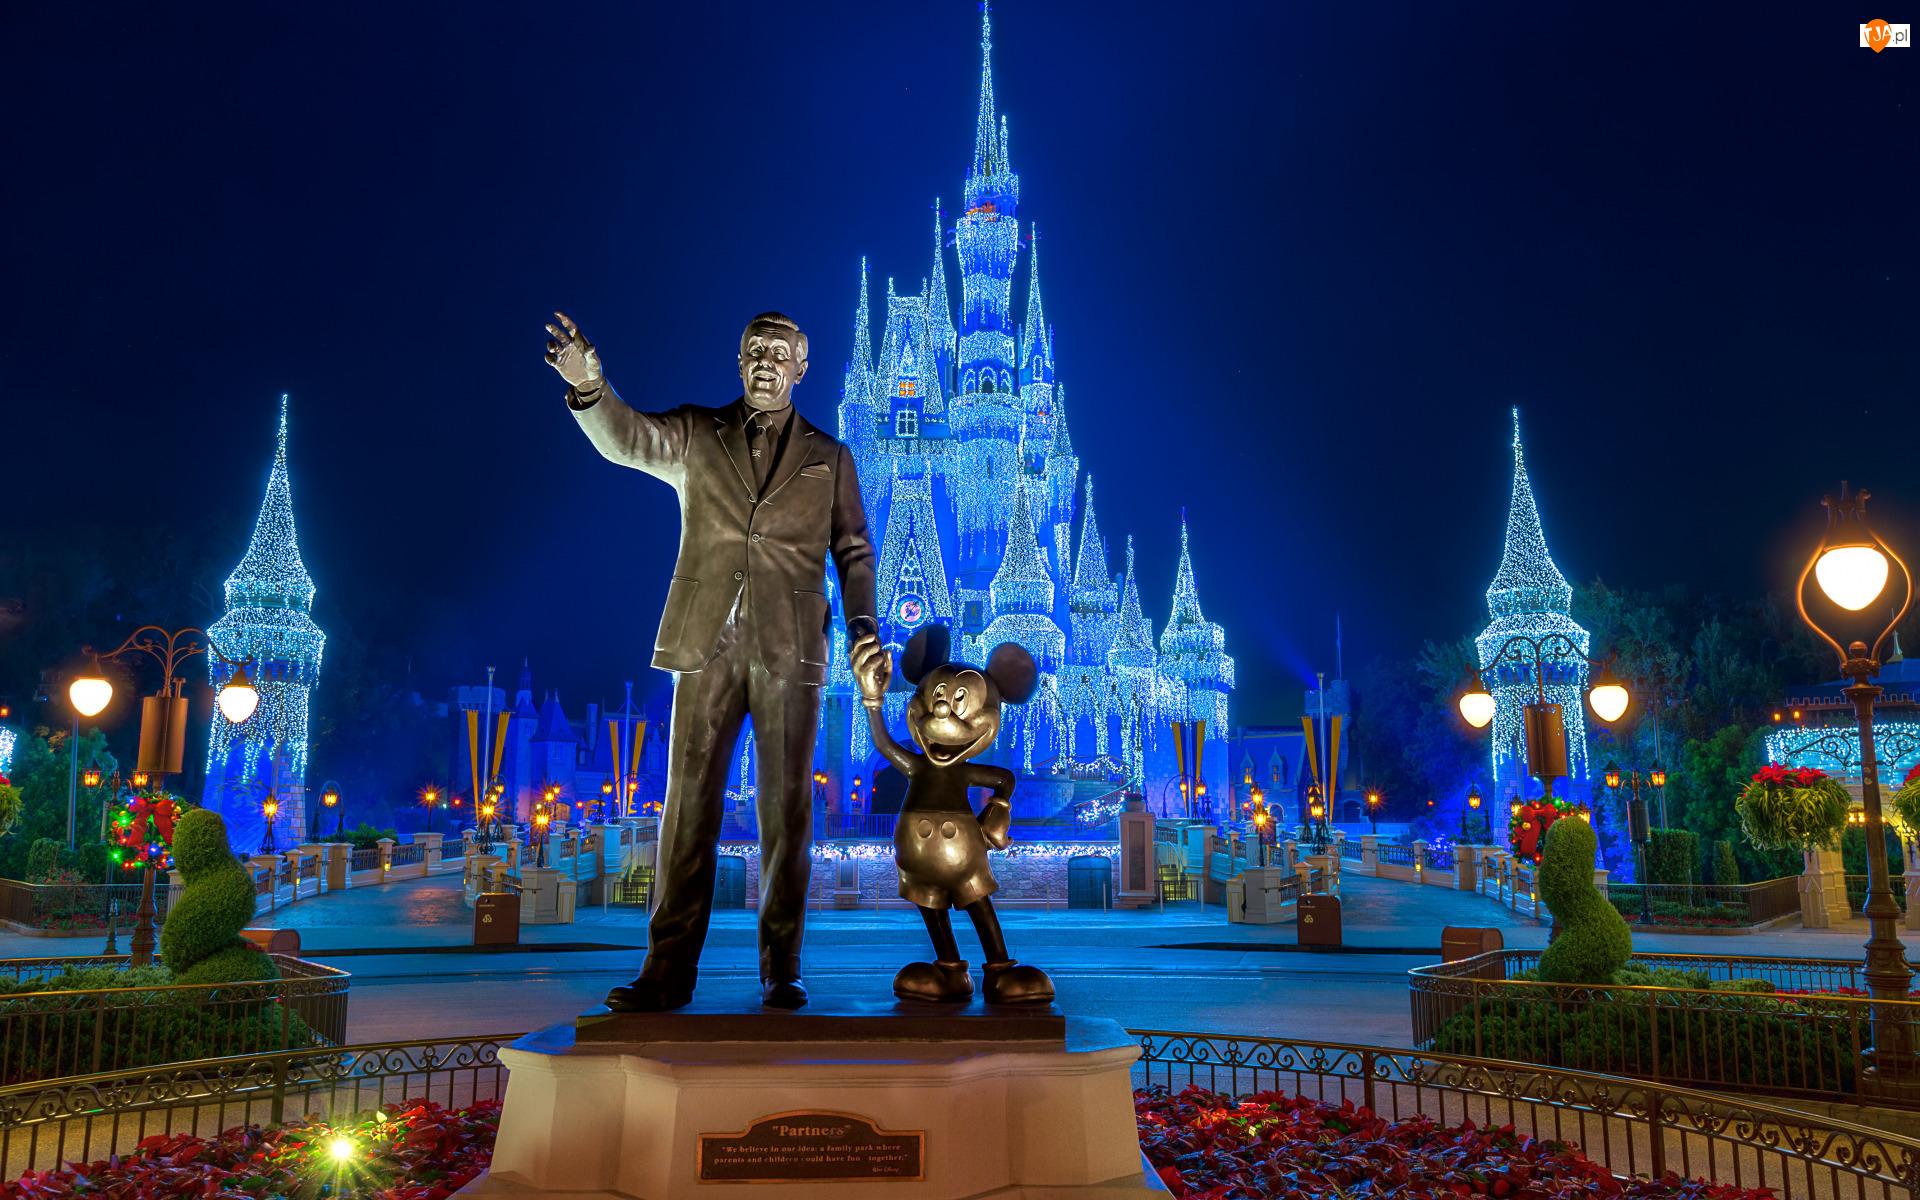 Stany Zjednoczone, Zamek, Orlando, Walt Disney, Disneyland, Park rozrywki, Pomnik, Walt Disney World Resort, Myszka Miki, Floryda